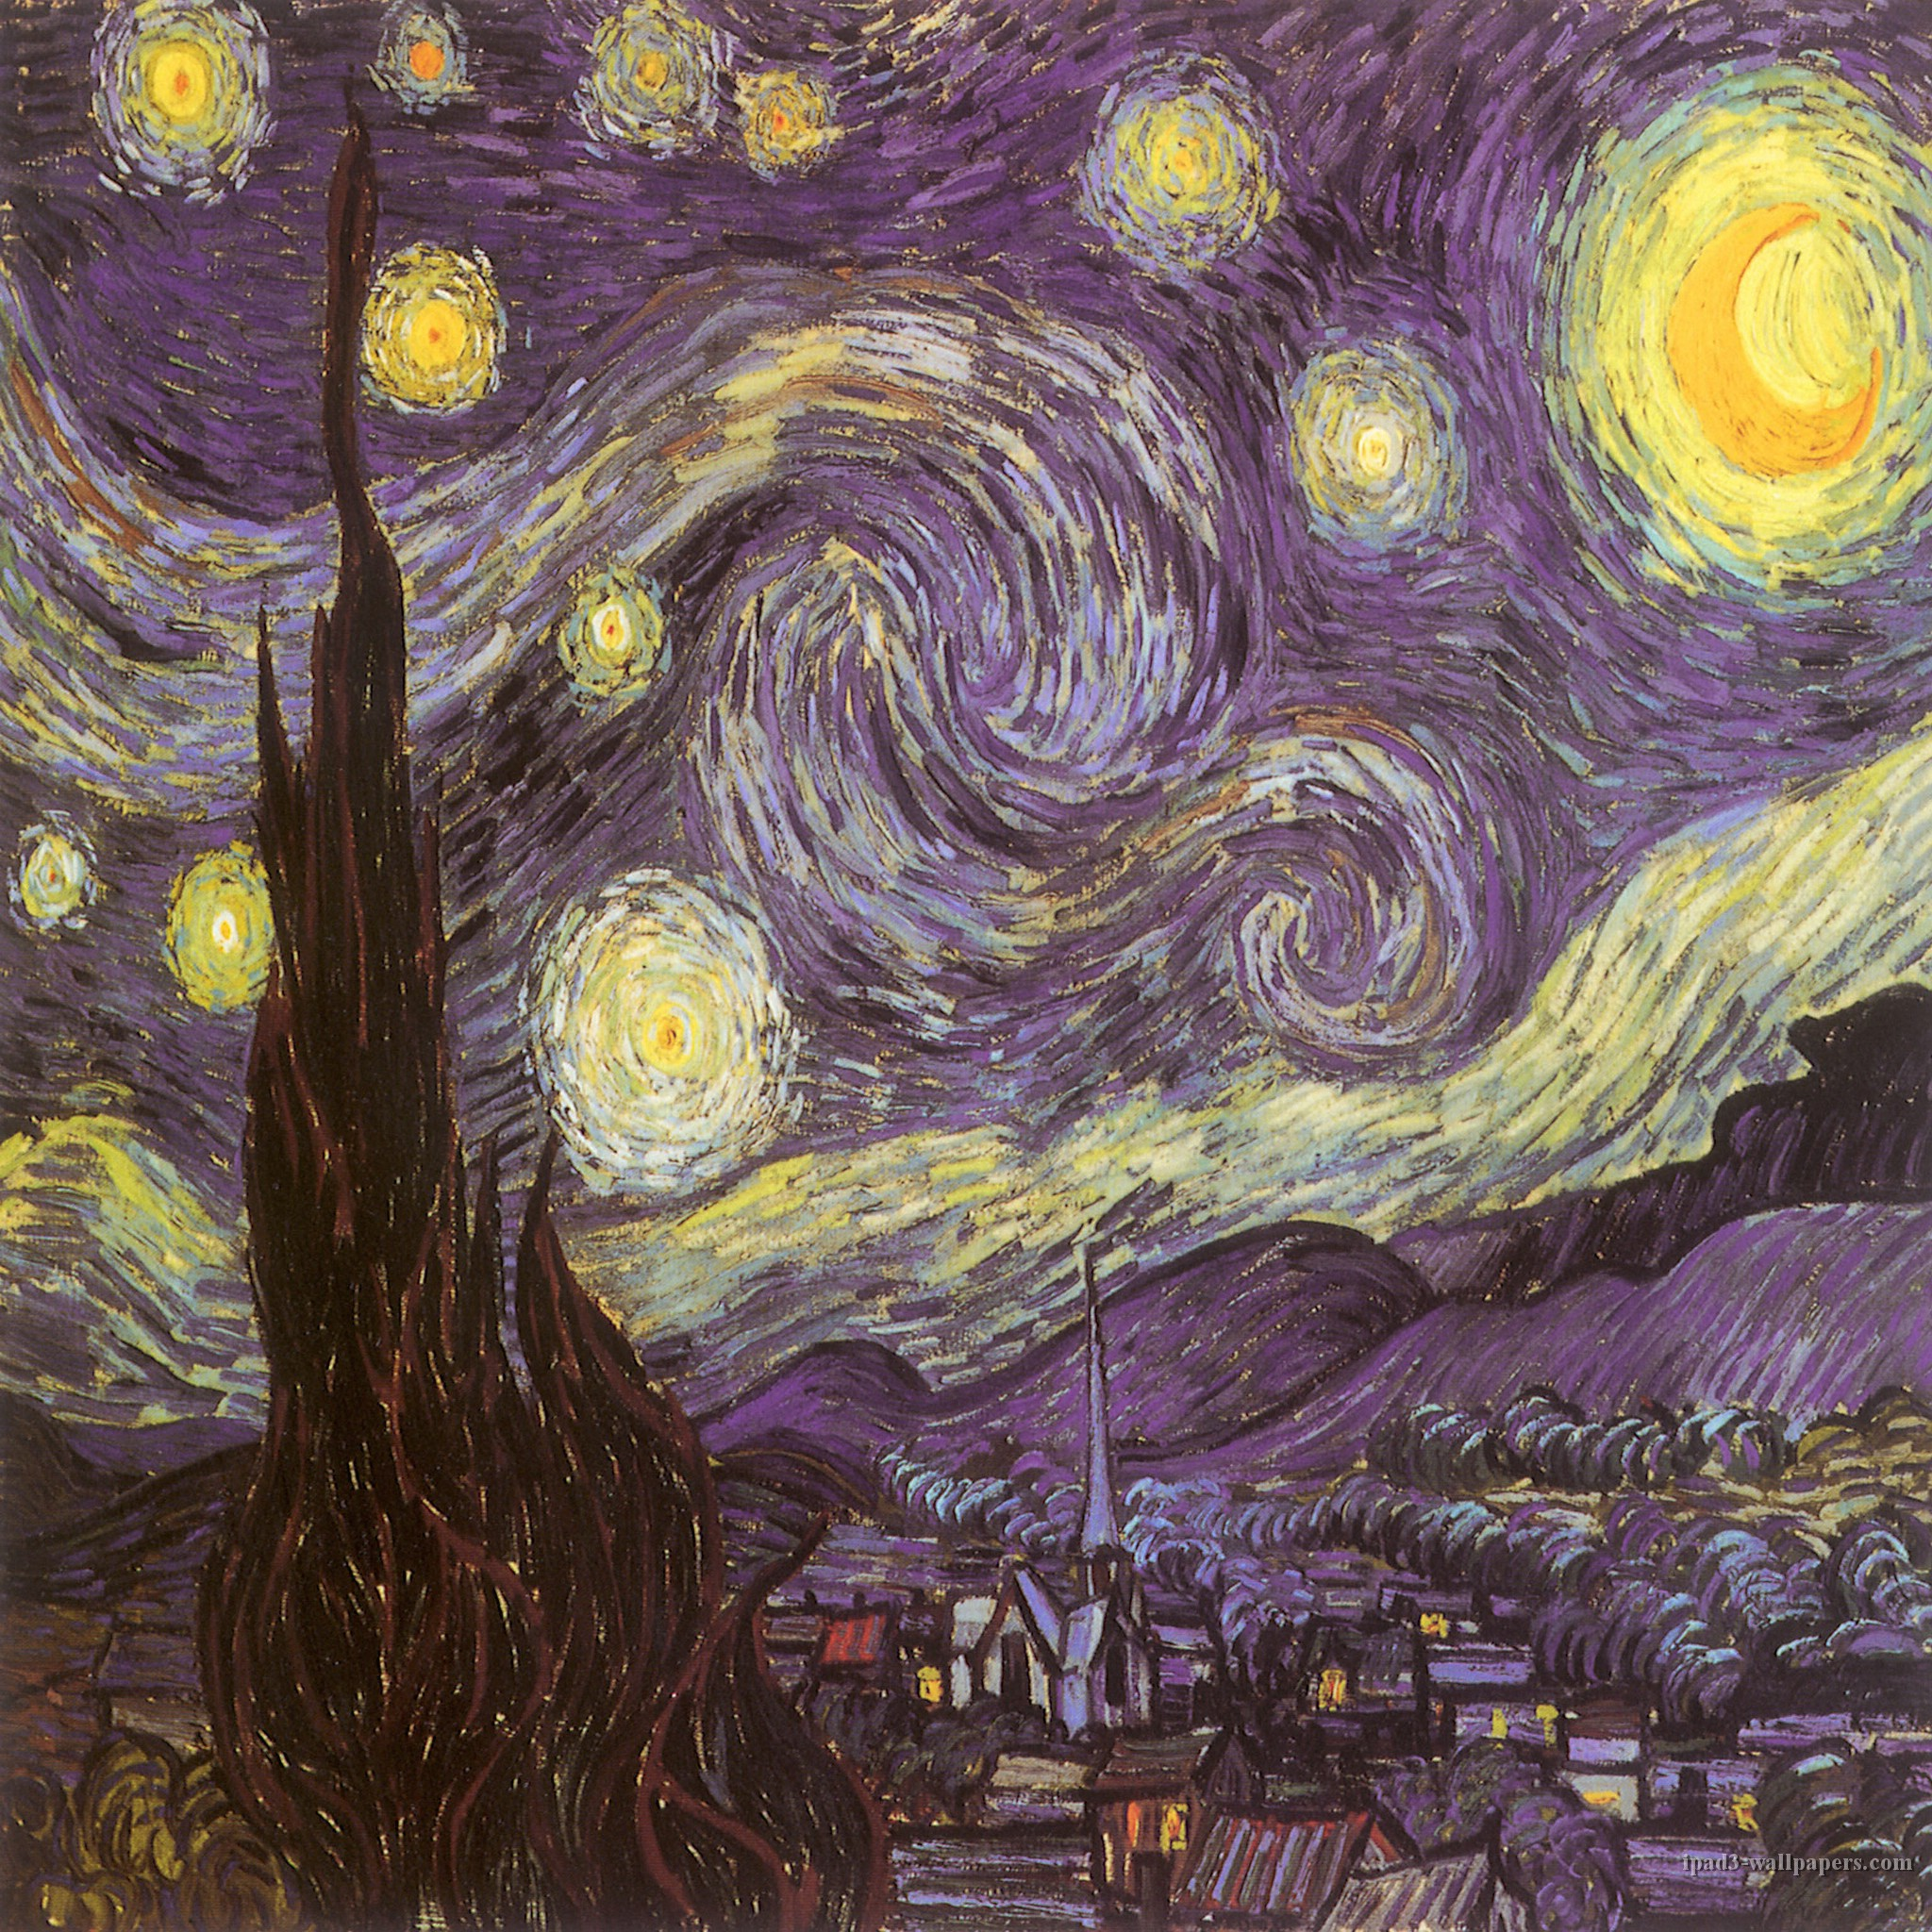 Van Gogh Wallpaper: Vincent Van Gogh Wallpapers